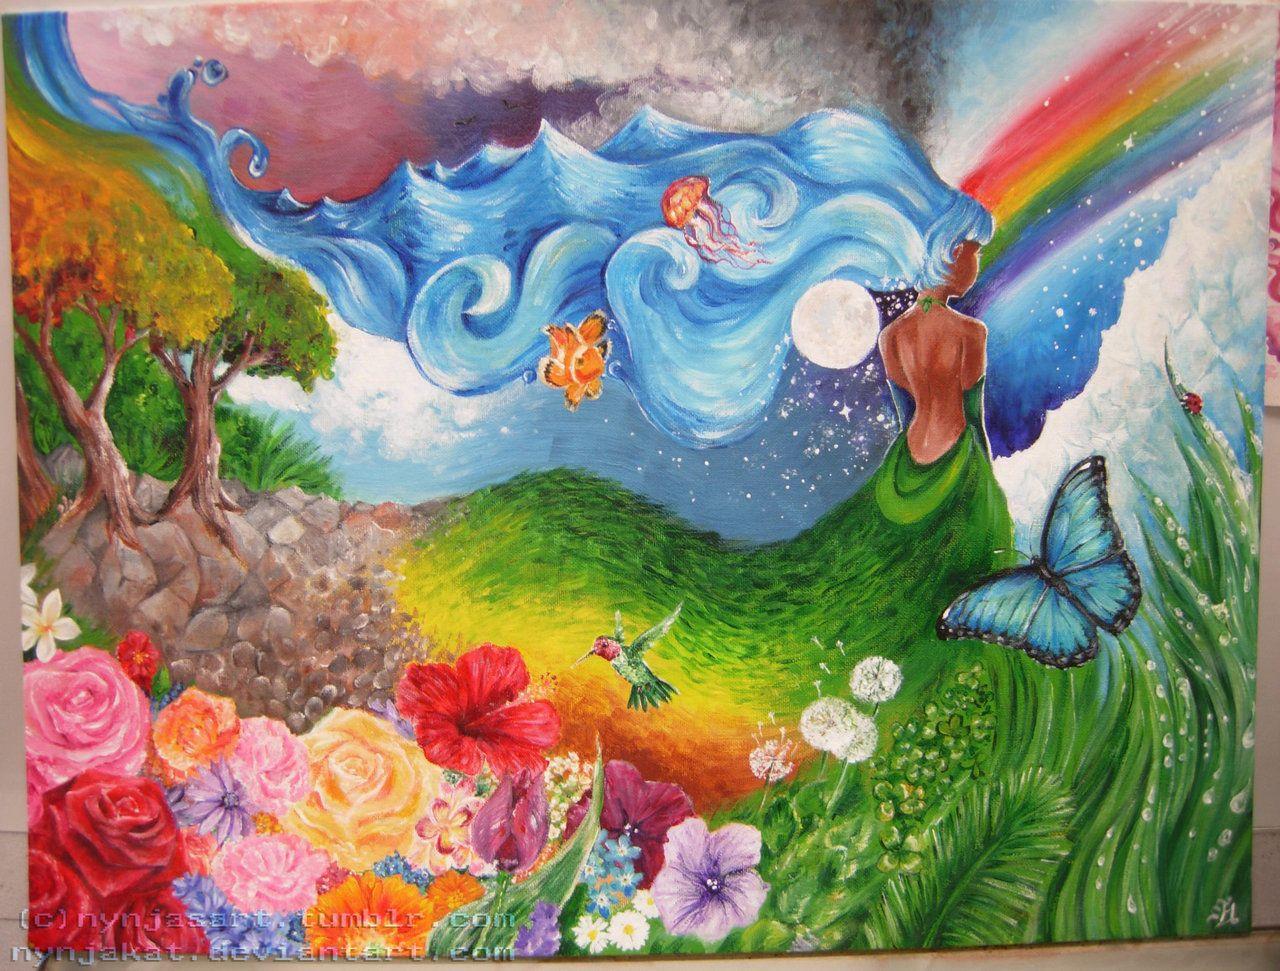 Mother Nature by NynjaKat.deviantart.com on @deviantART ...